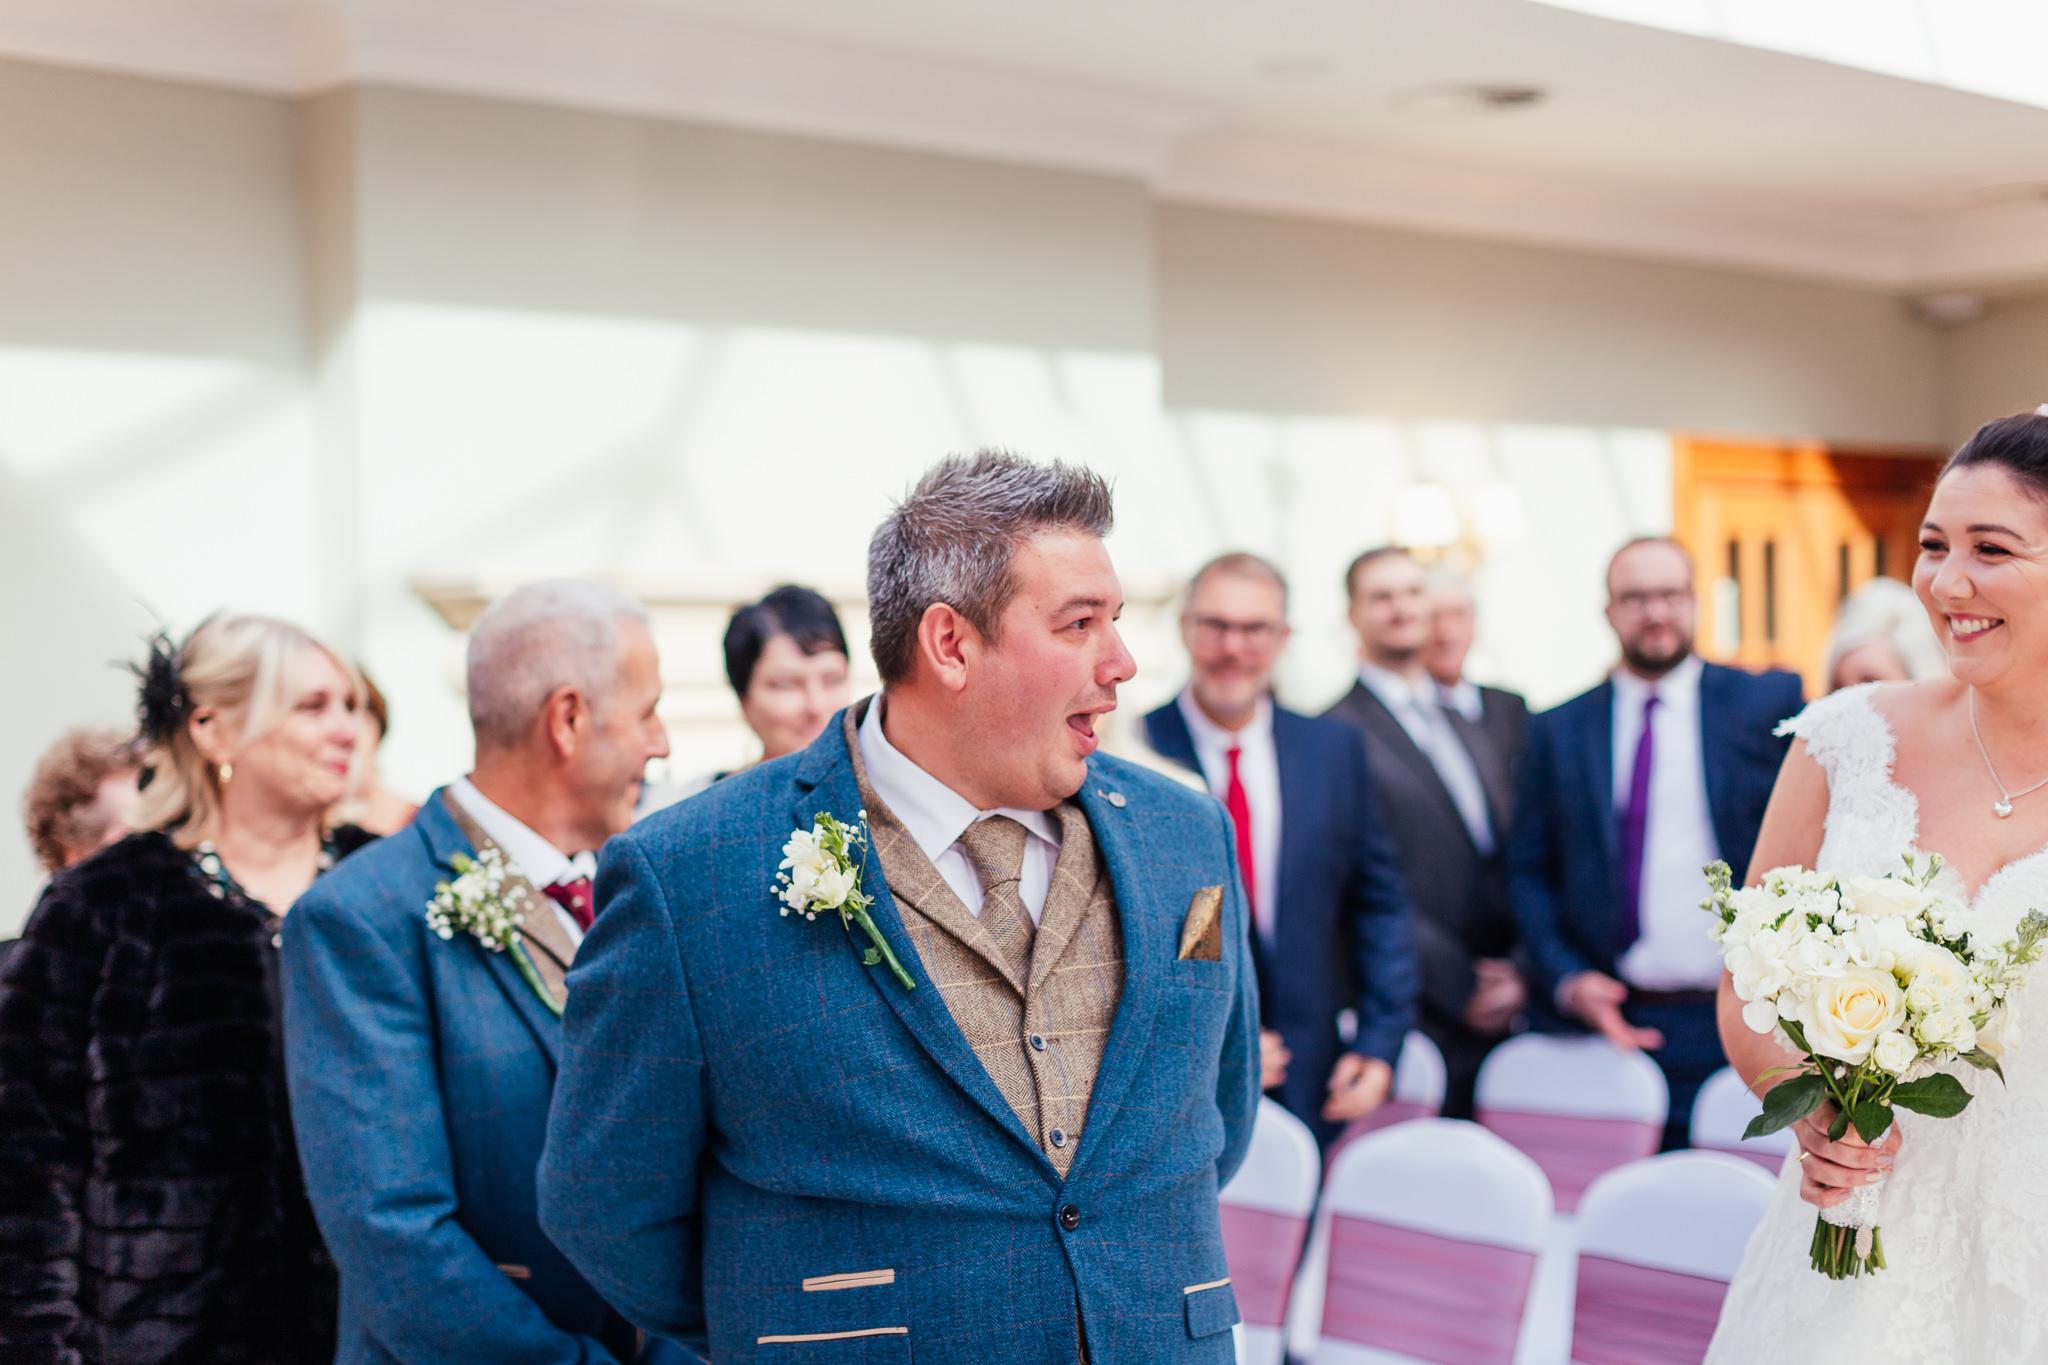 Willington-Hall-Cheshire-Wedding-12.jpg